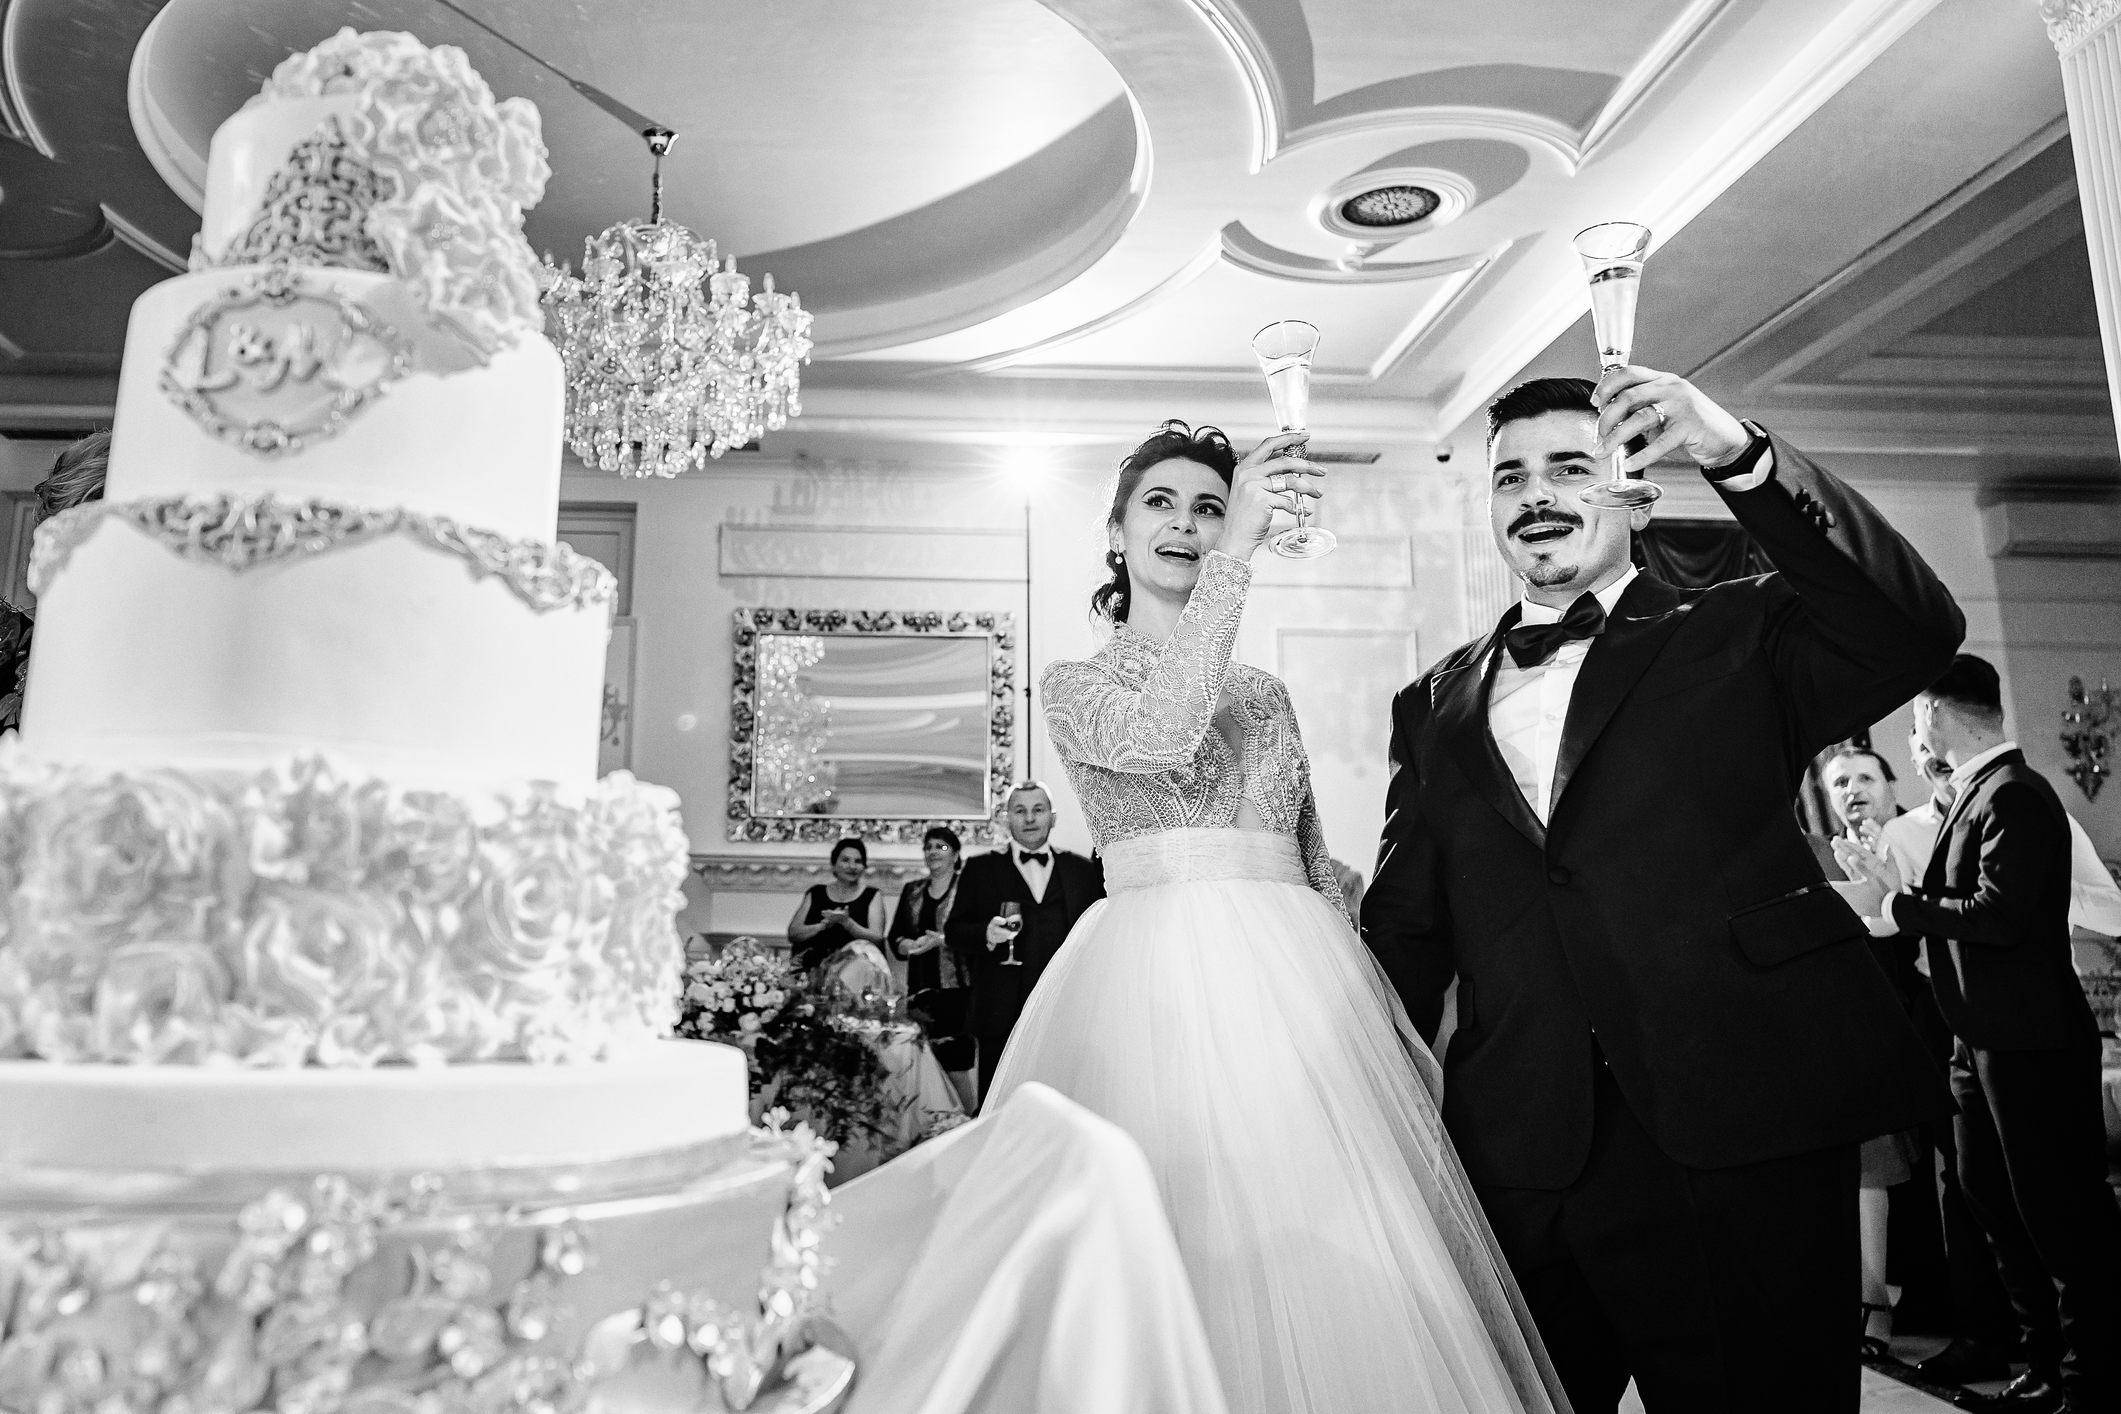 fotograf nunta bucuresti laurentiu nica  31 - Lorena & Matei | Fotografii nunta Bucuresti | Restaurant Domeniul cu Ciresi